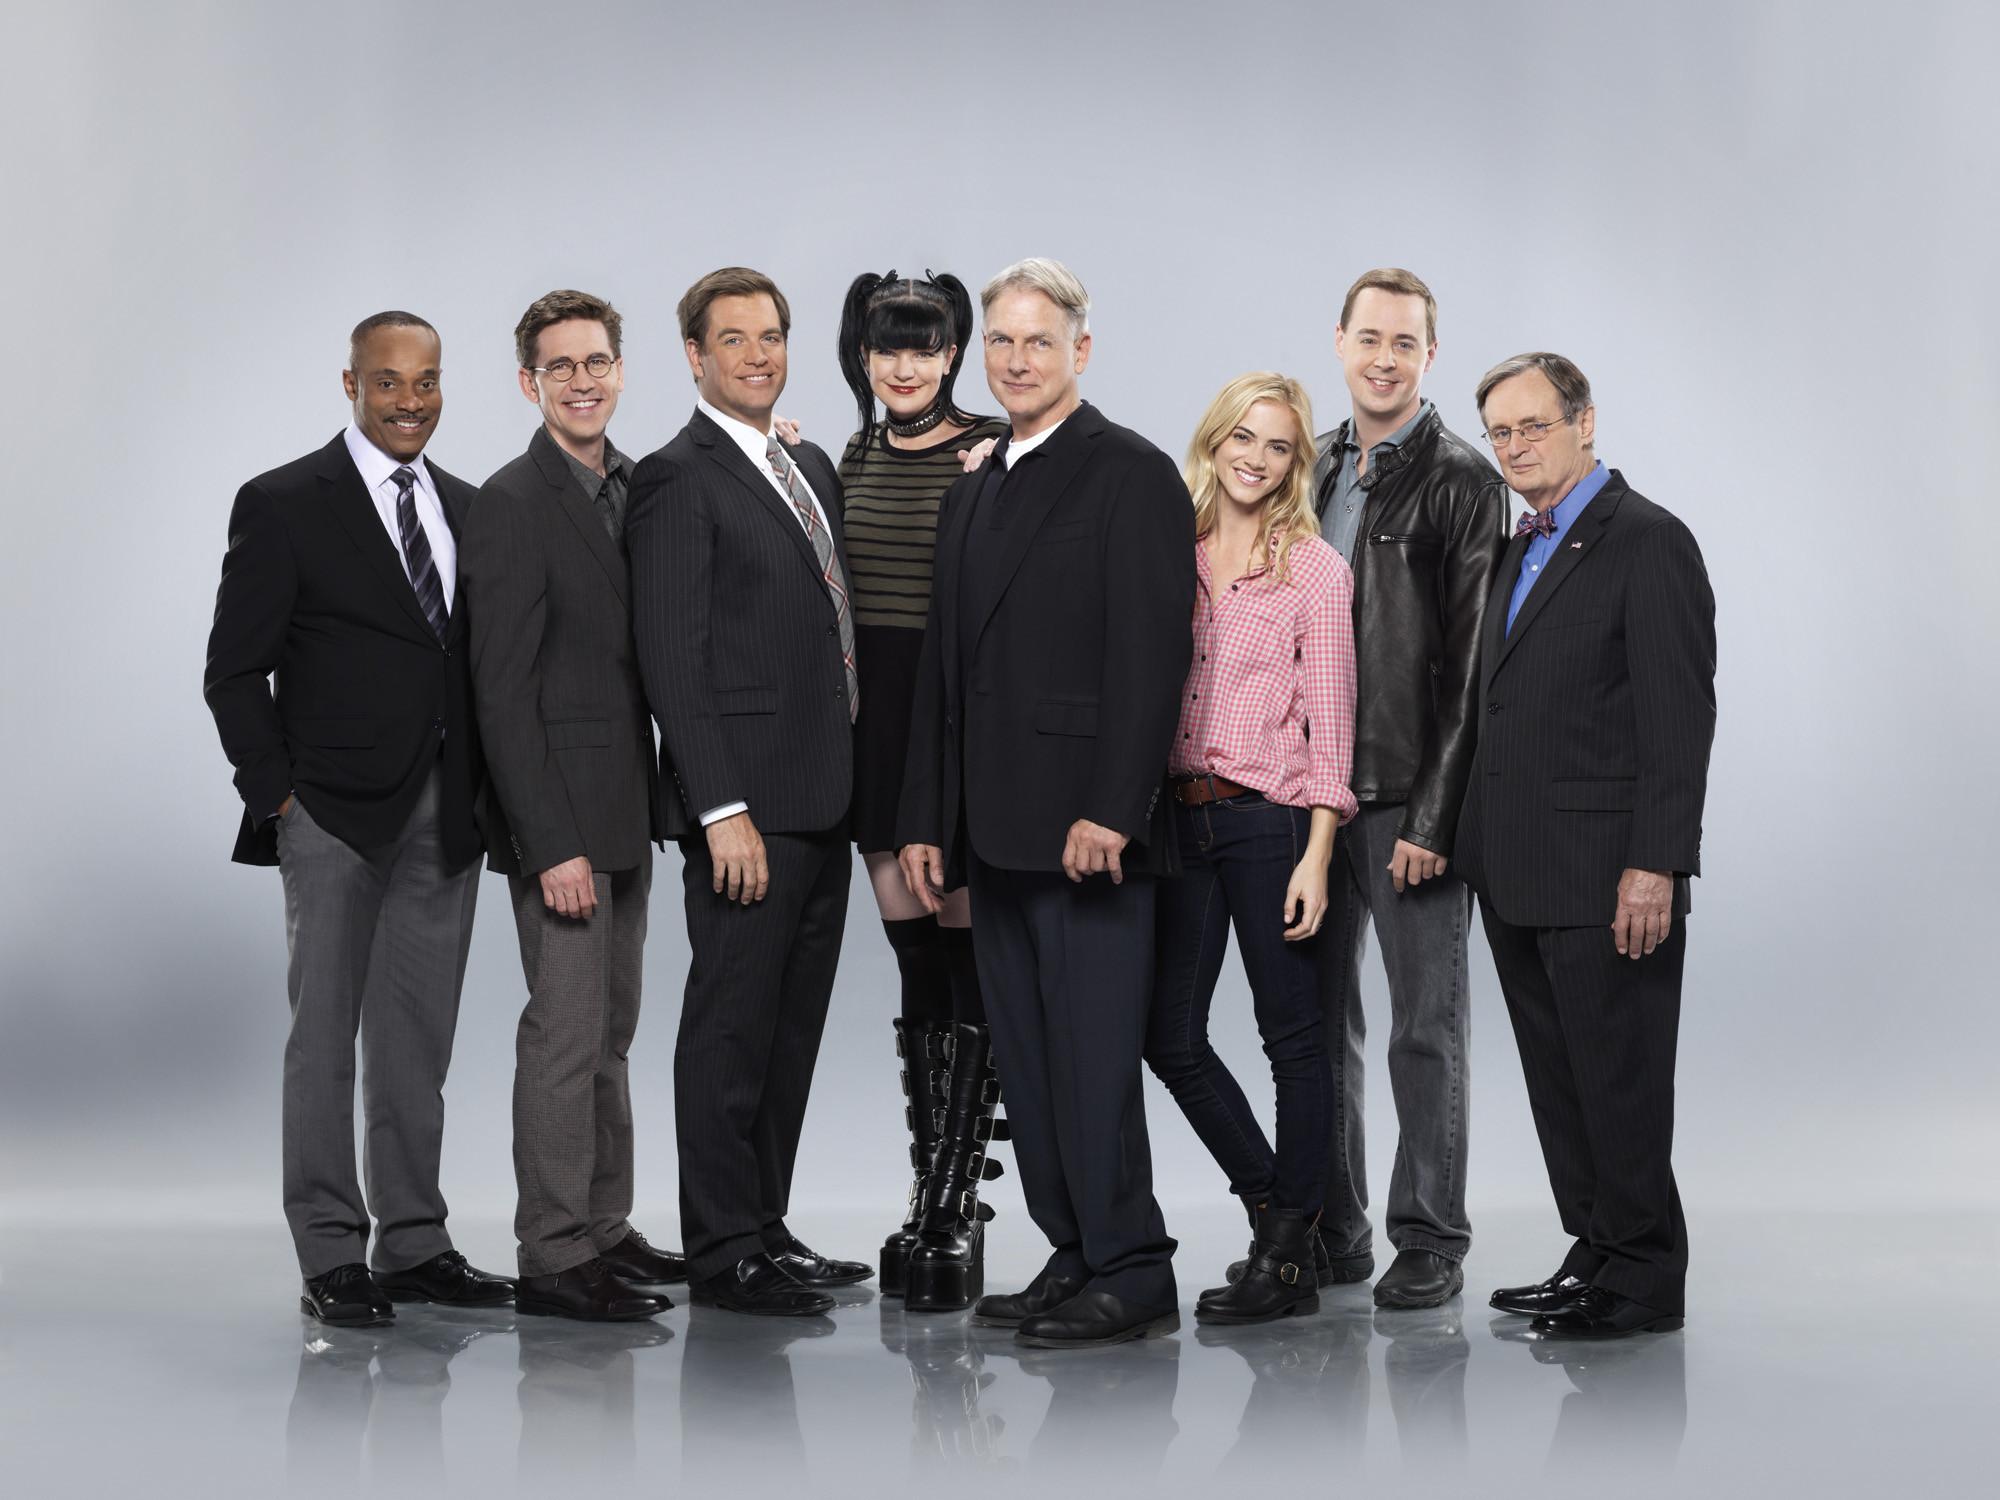 ncis tv series cast - photo #17